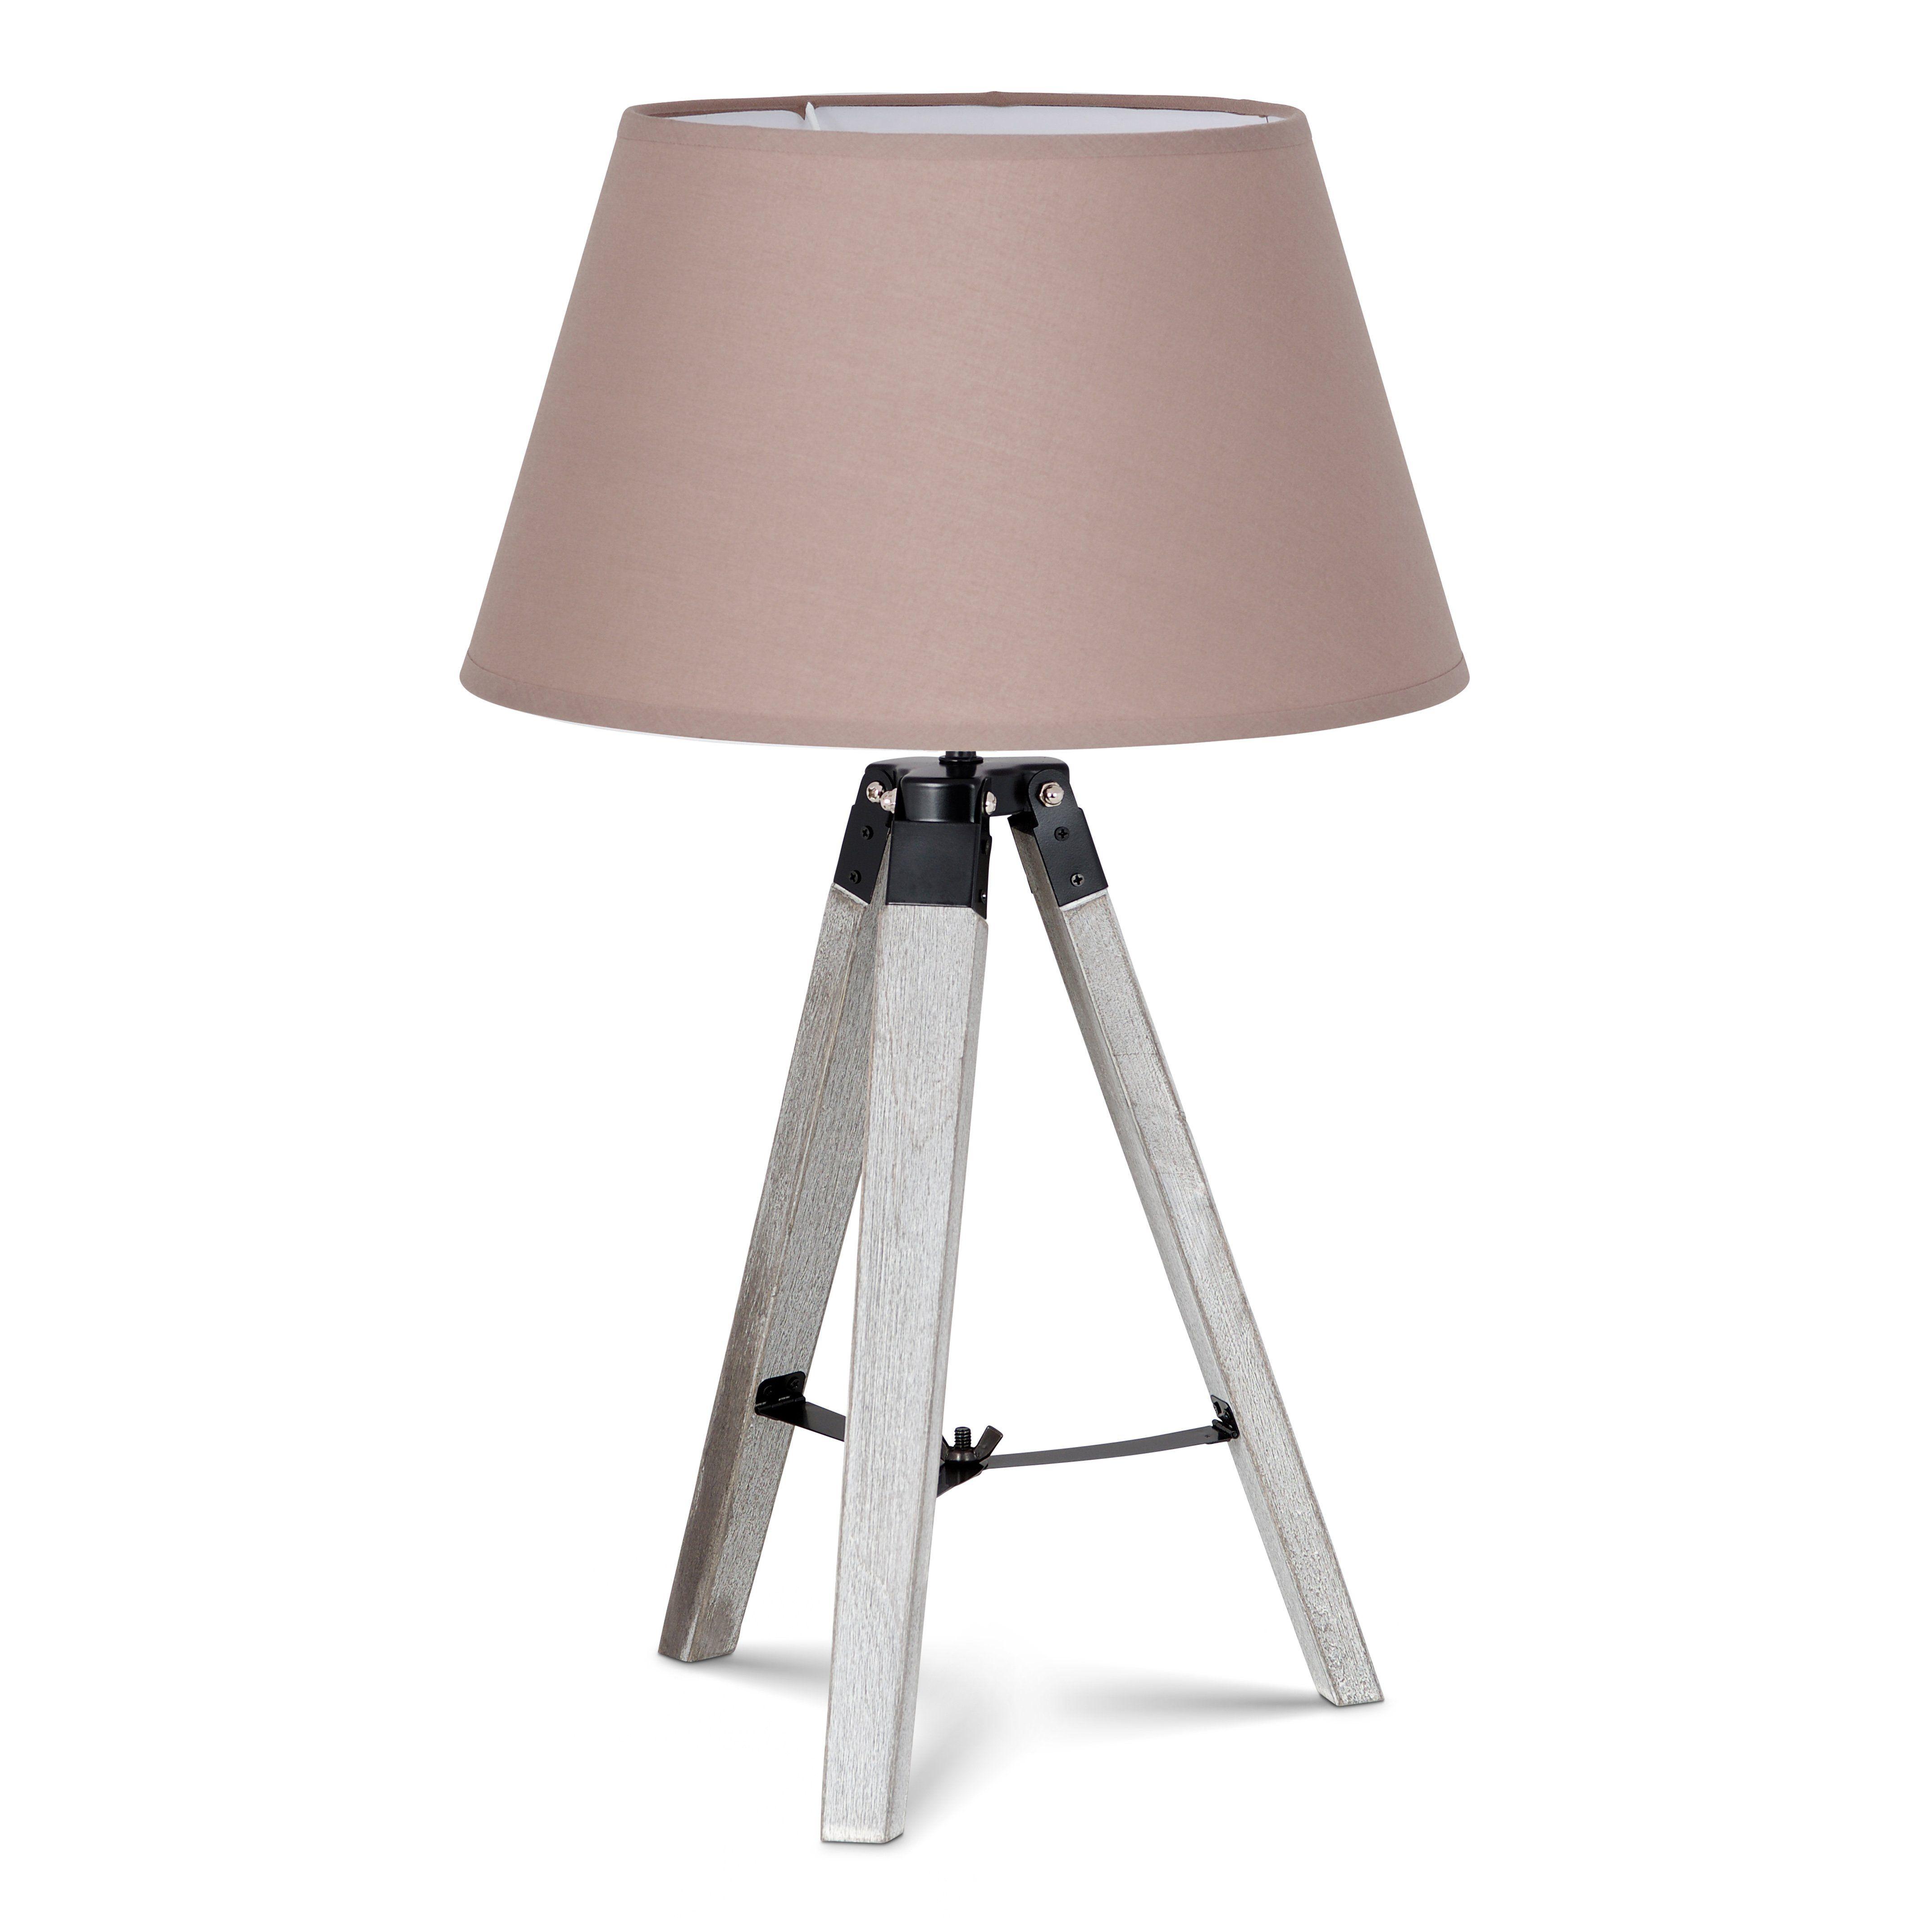 Home sweet home tafellamp Dia wit met lampenkap Largo - taupe